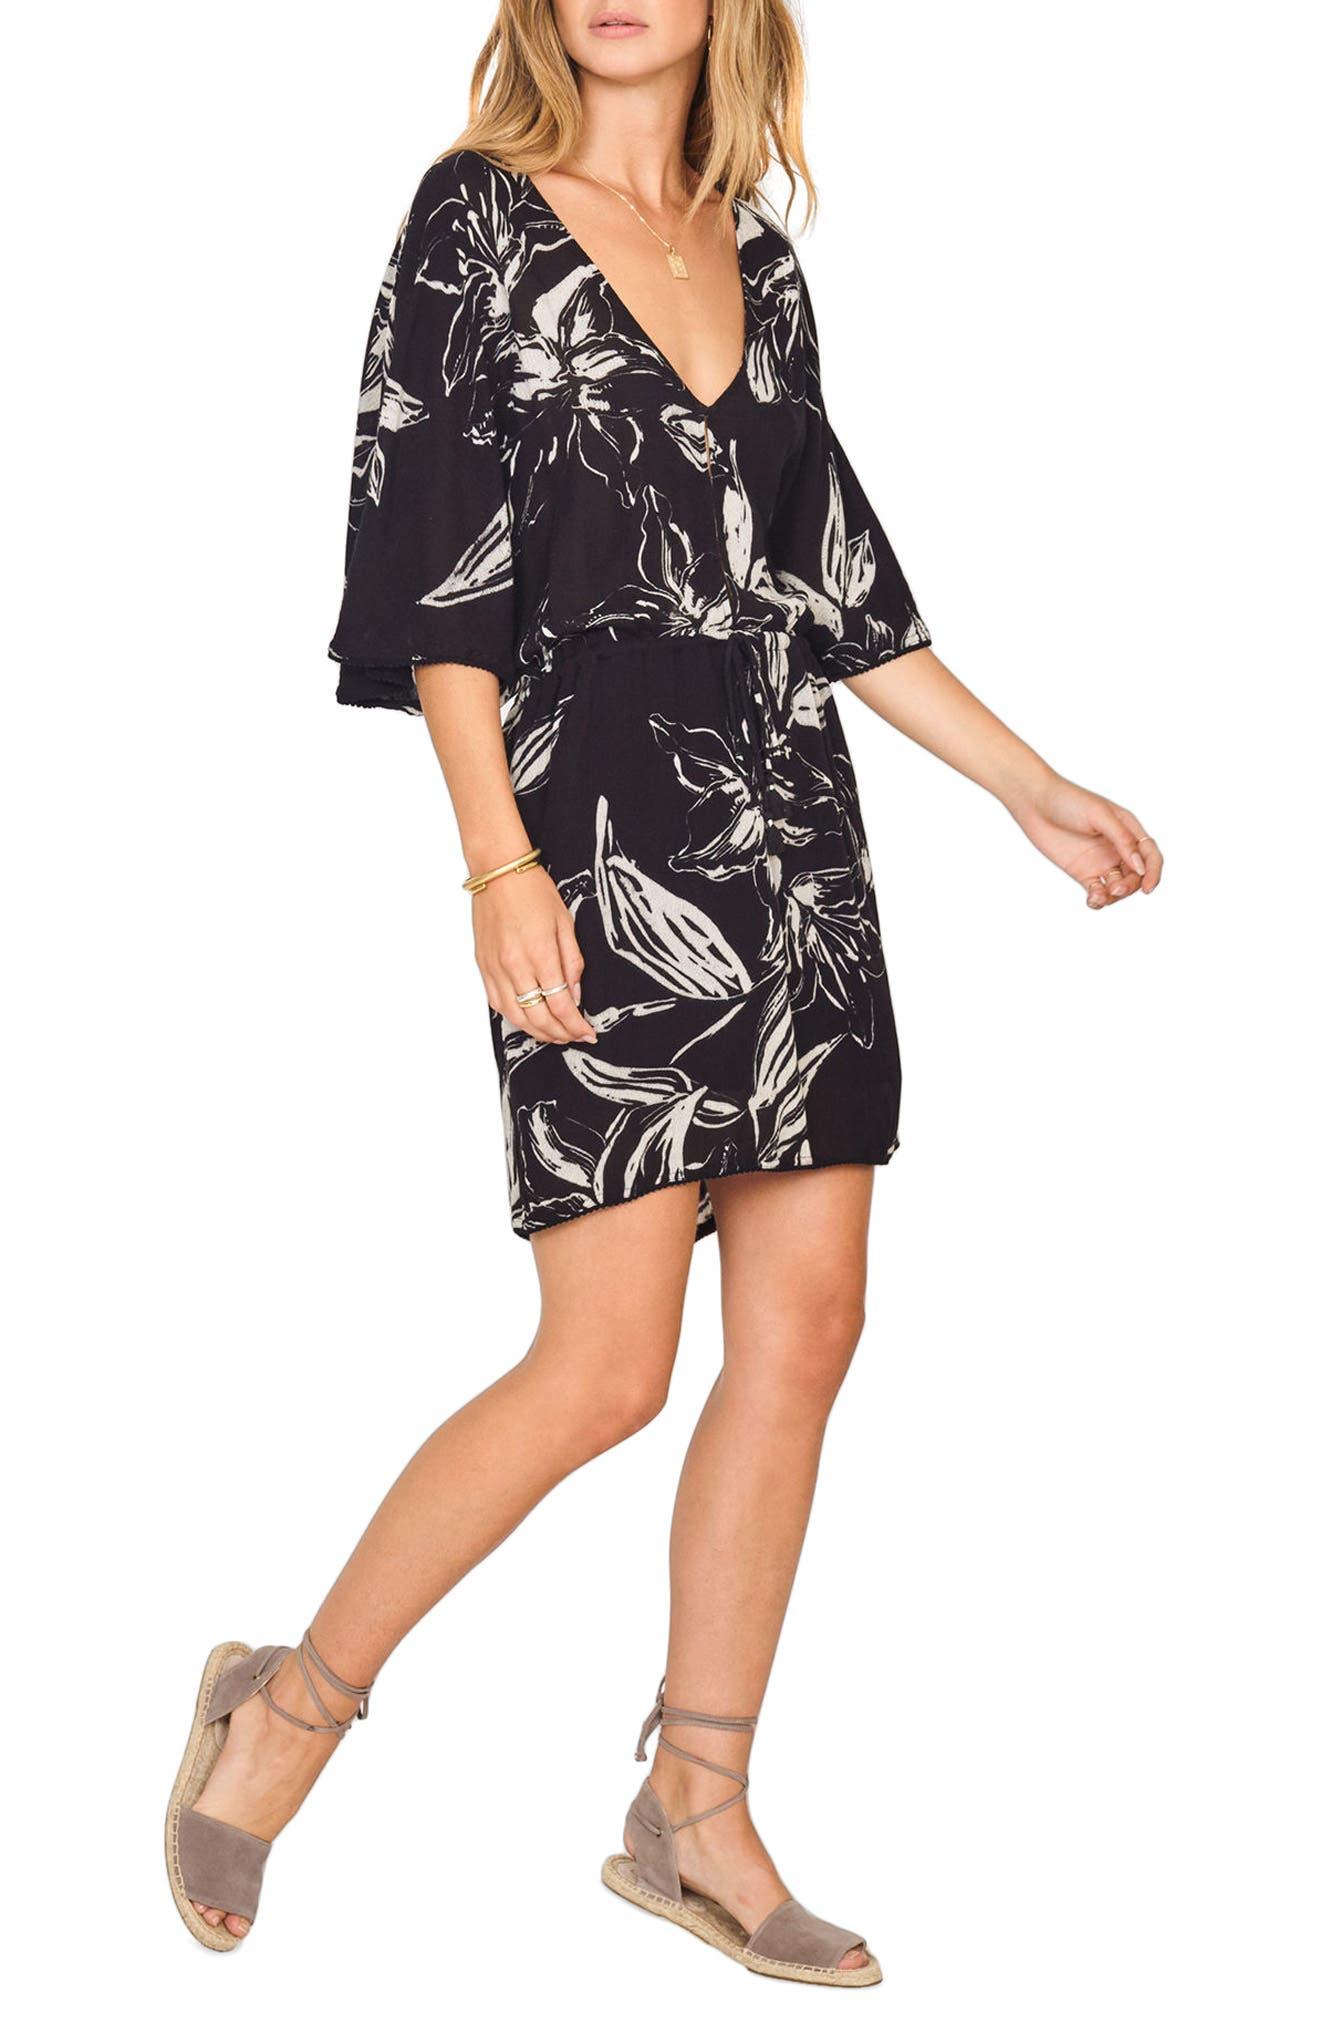 Main Image - Amuse Society Cross My Heart Floral Print Dress